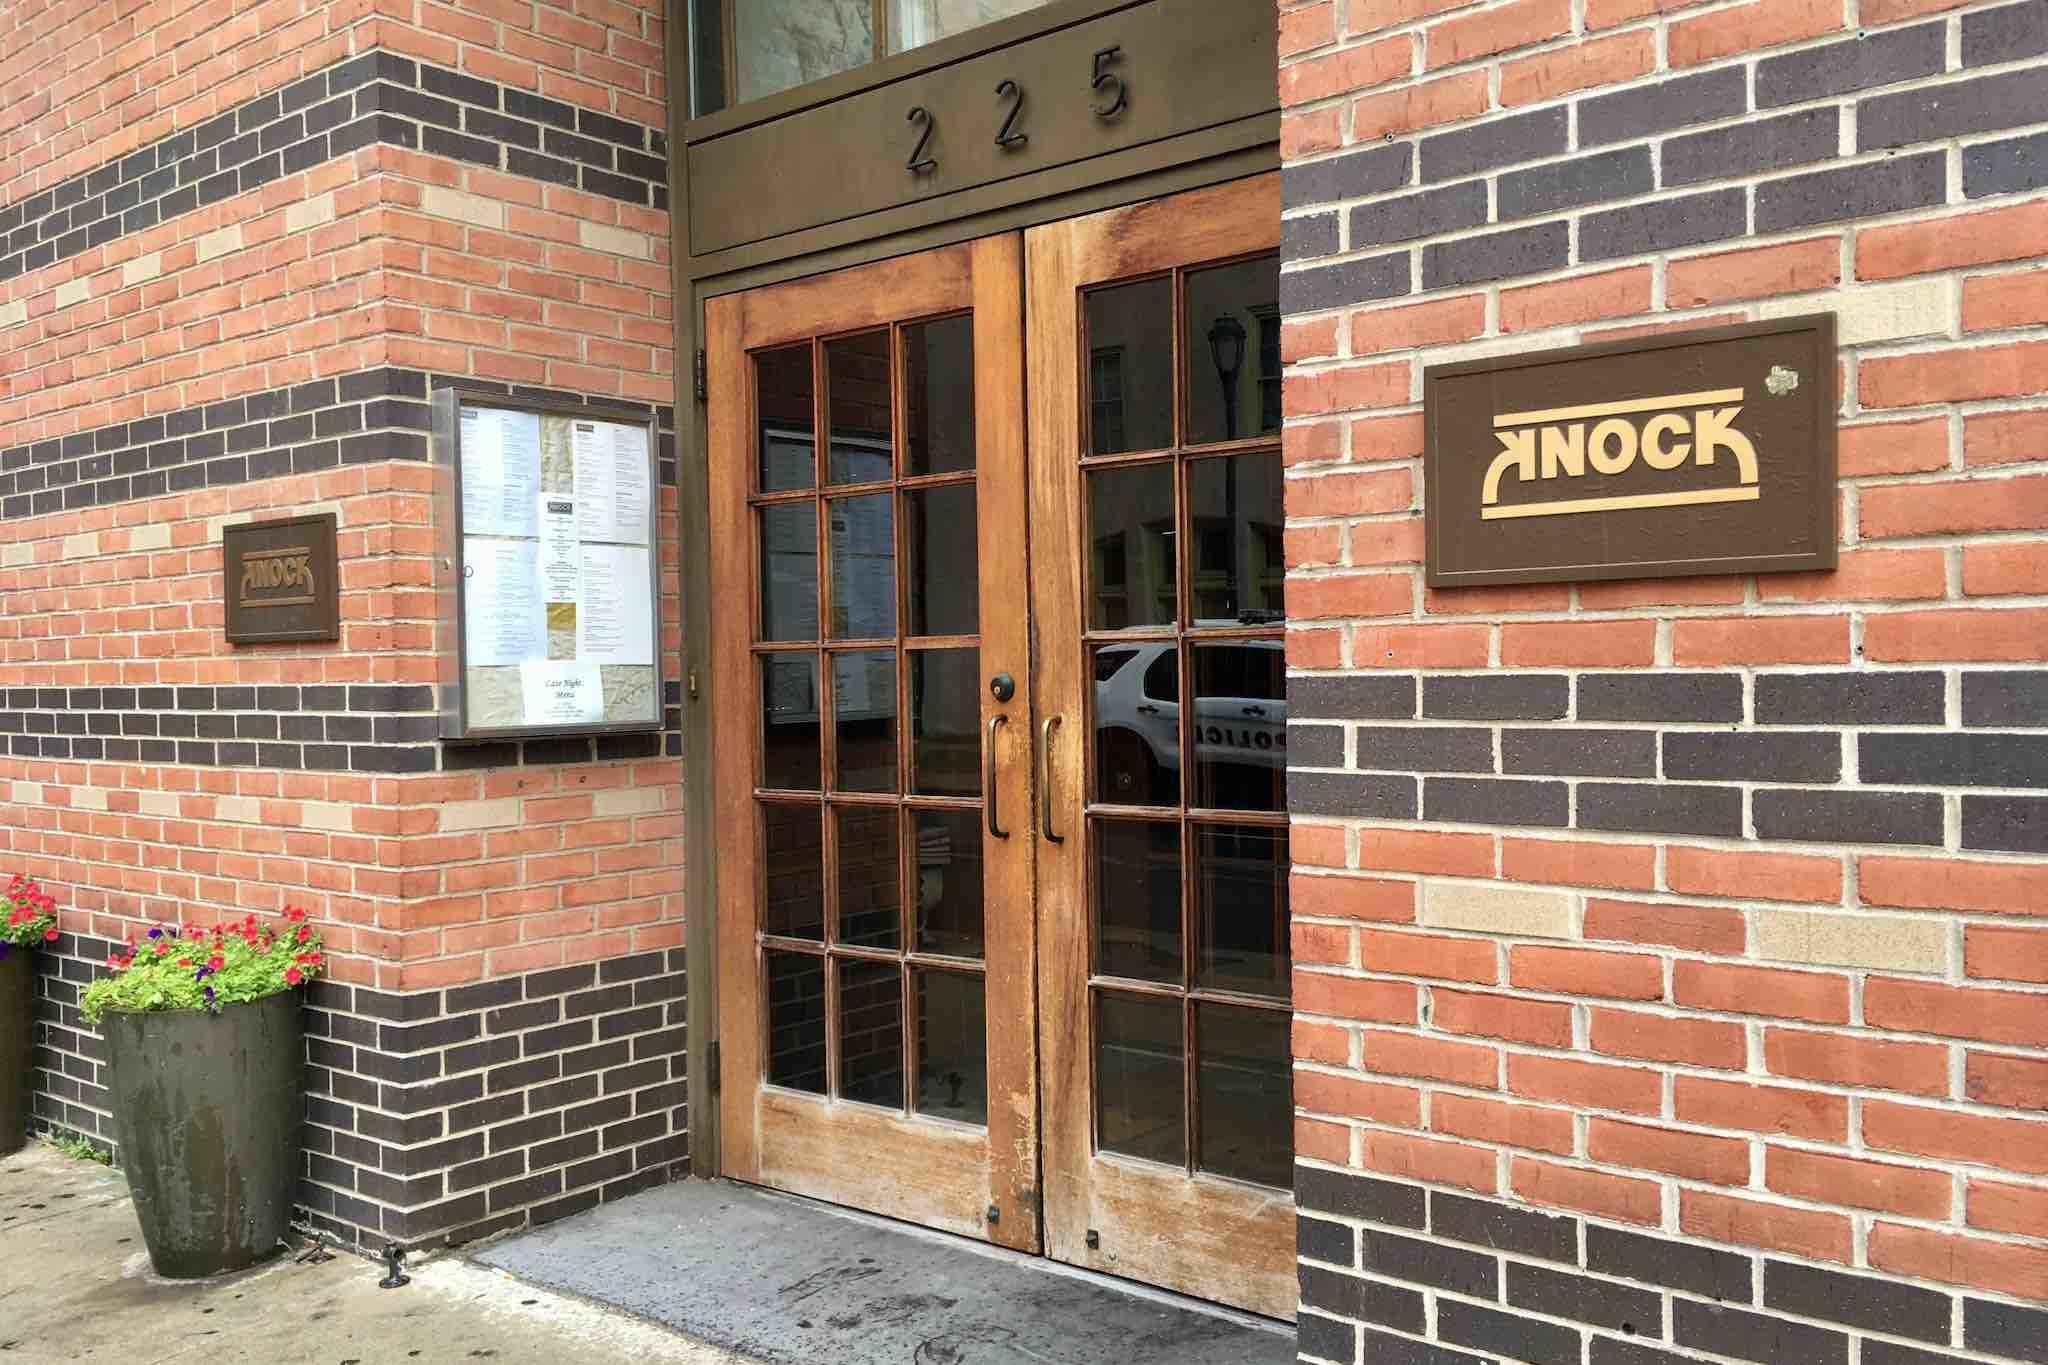 Knock Restaurant and Bar